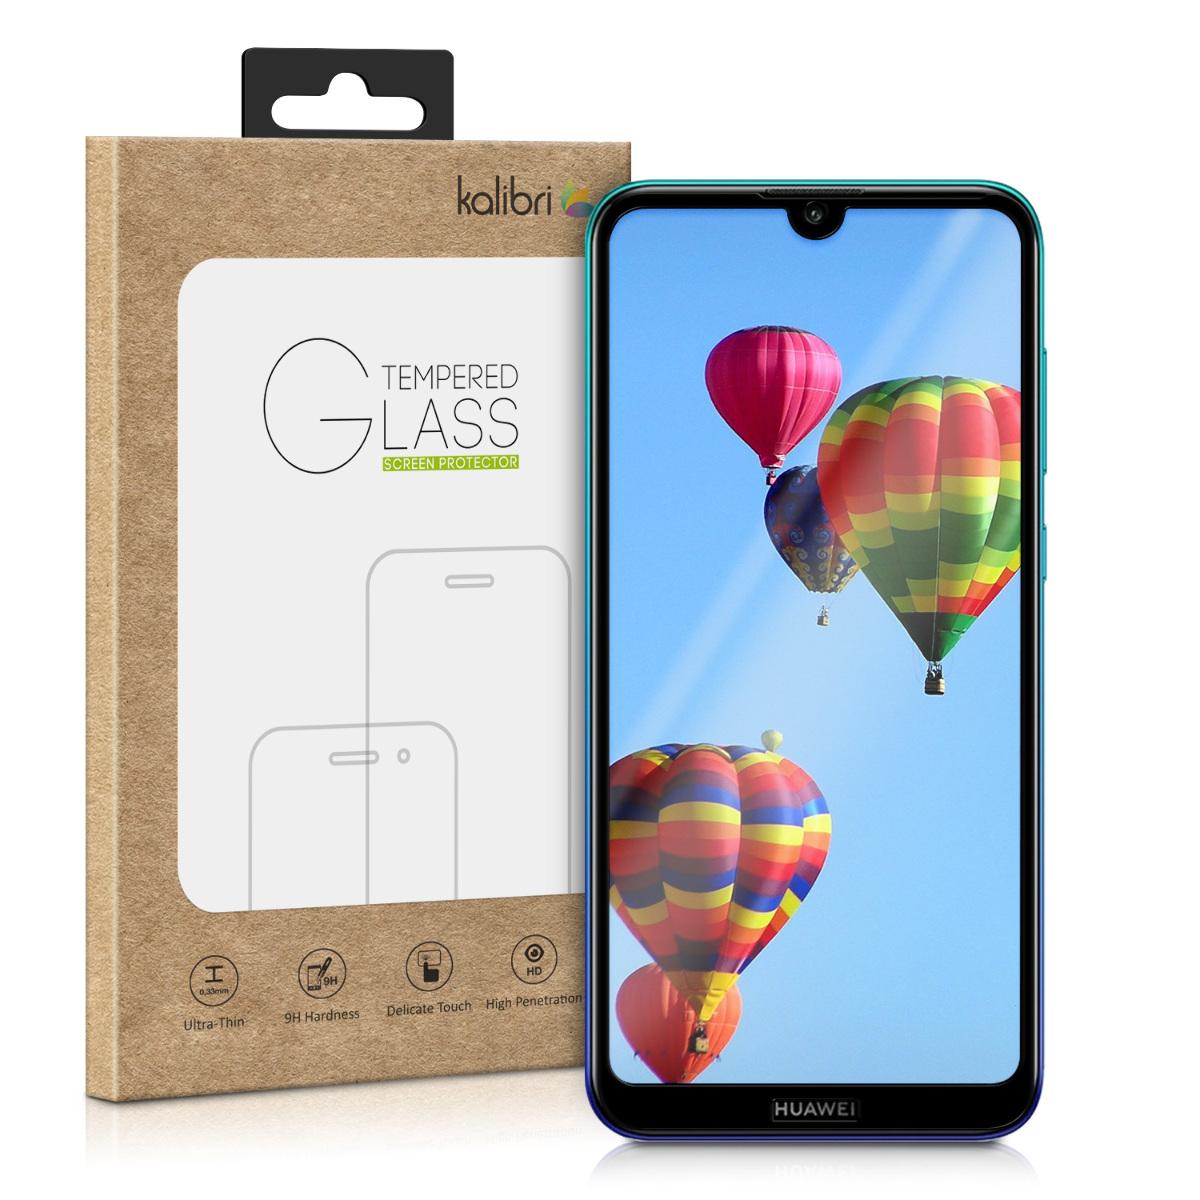 Kalibri Tempered Glass - Fullface Αντιχαρακτικό Γυαλί Οθόνης Huawei Y7 2019 / Y7 Prime 2019 - Black (48805.01)